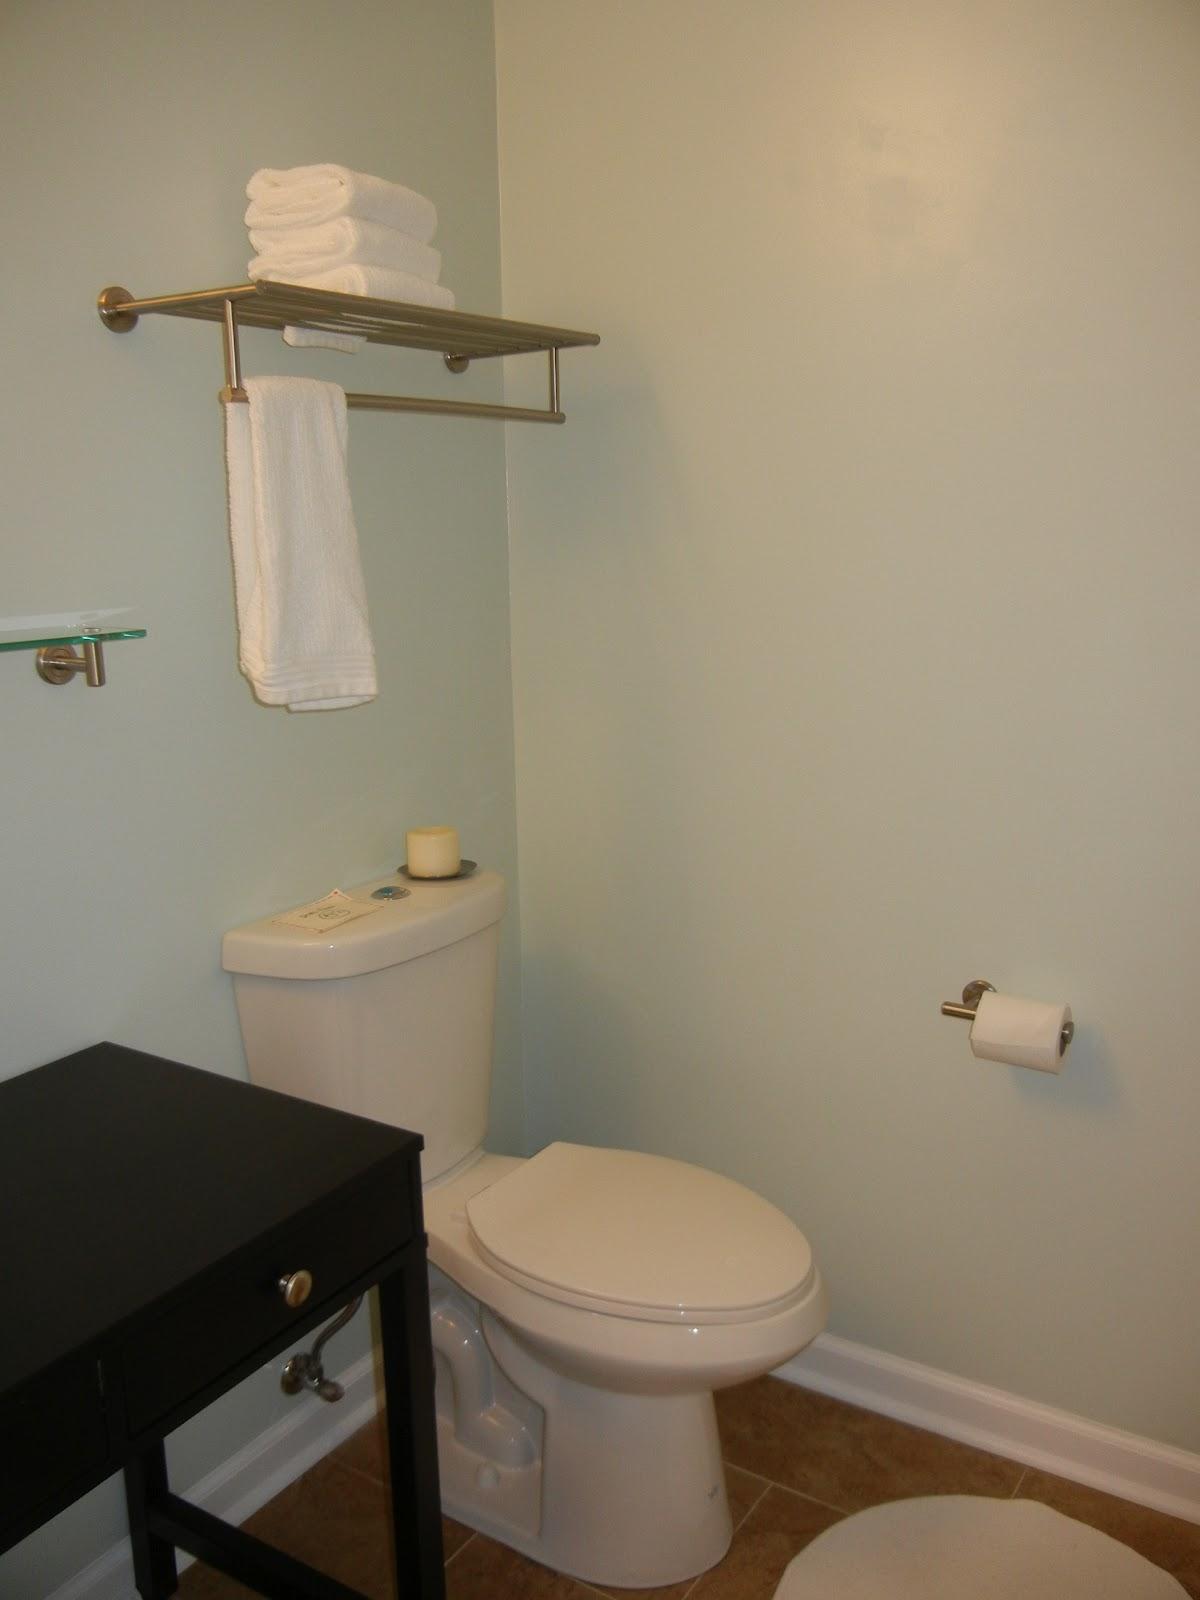 Lowes Bathroom Shelves Its Not Rocket Science Omg Bathroom Update